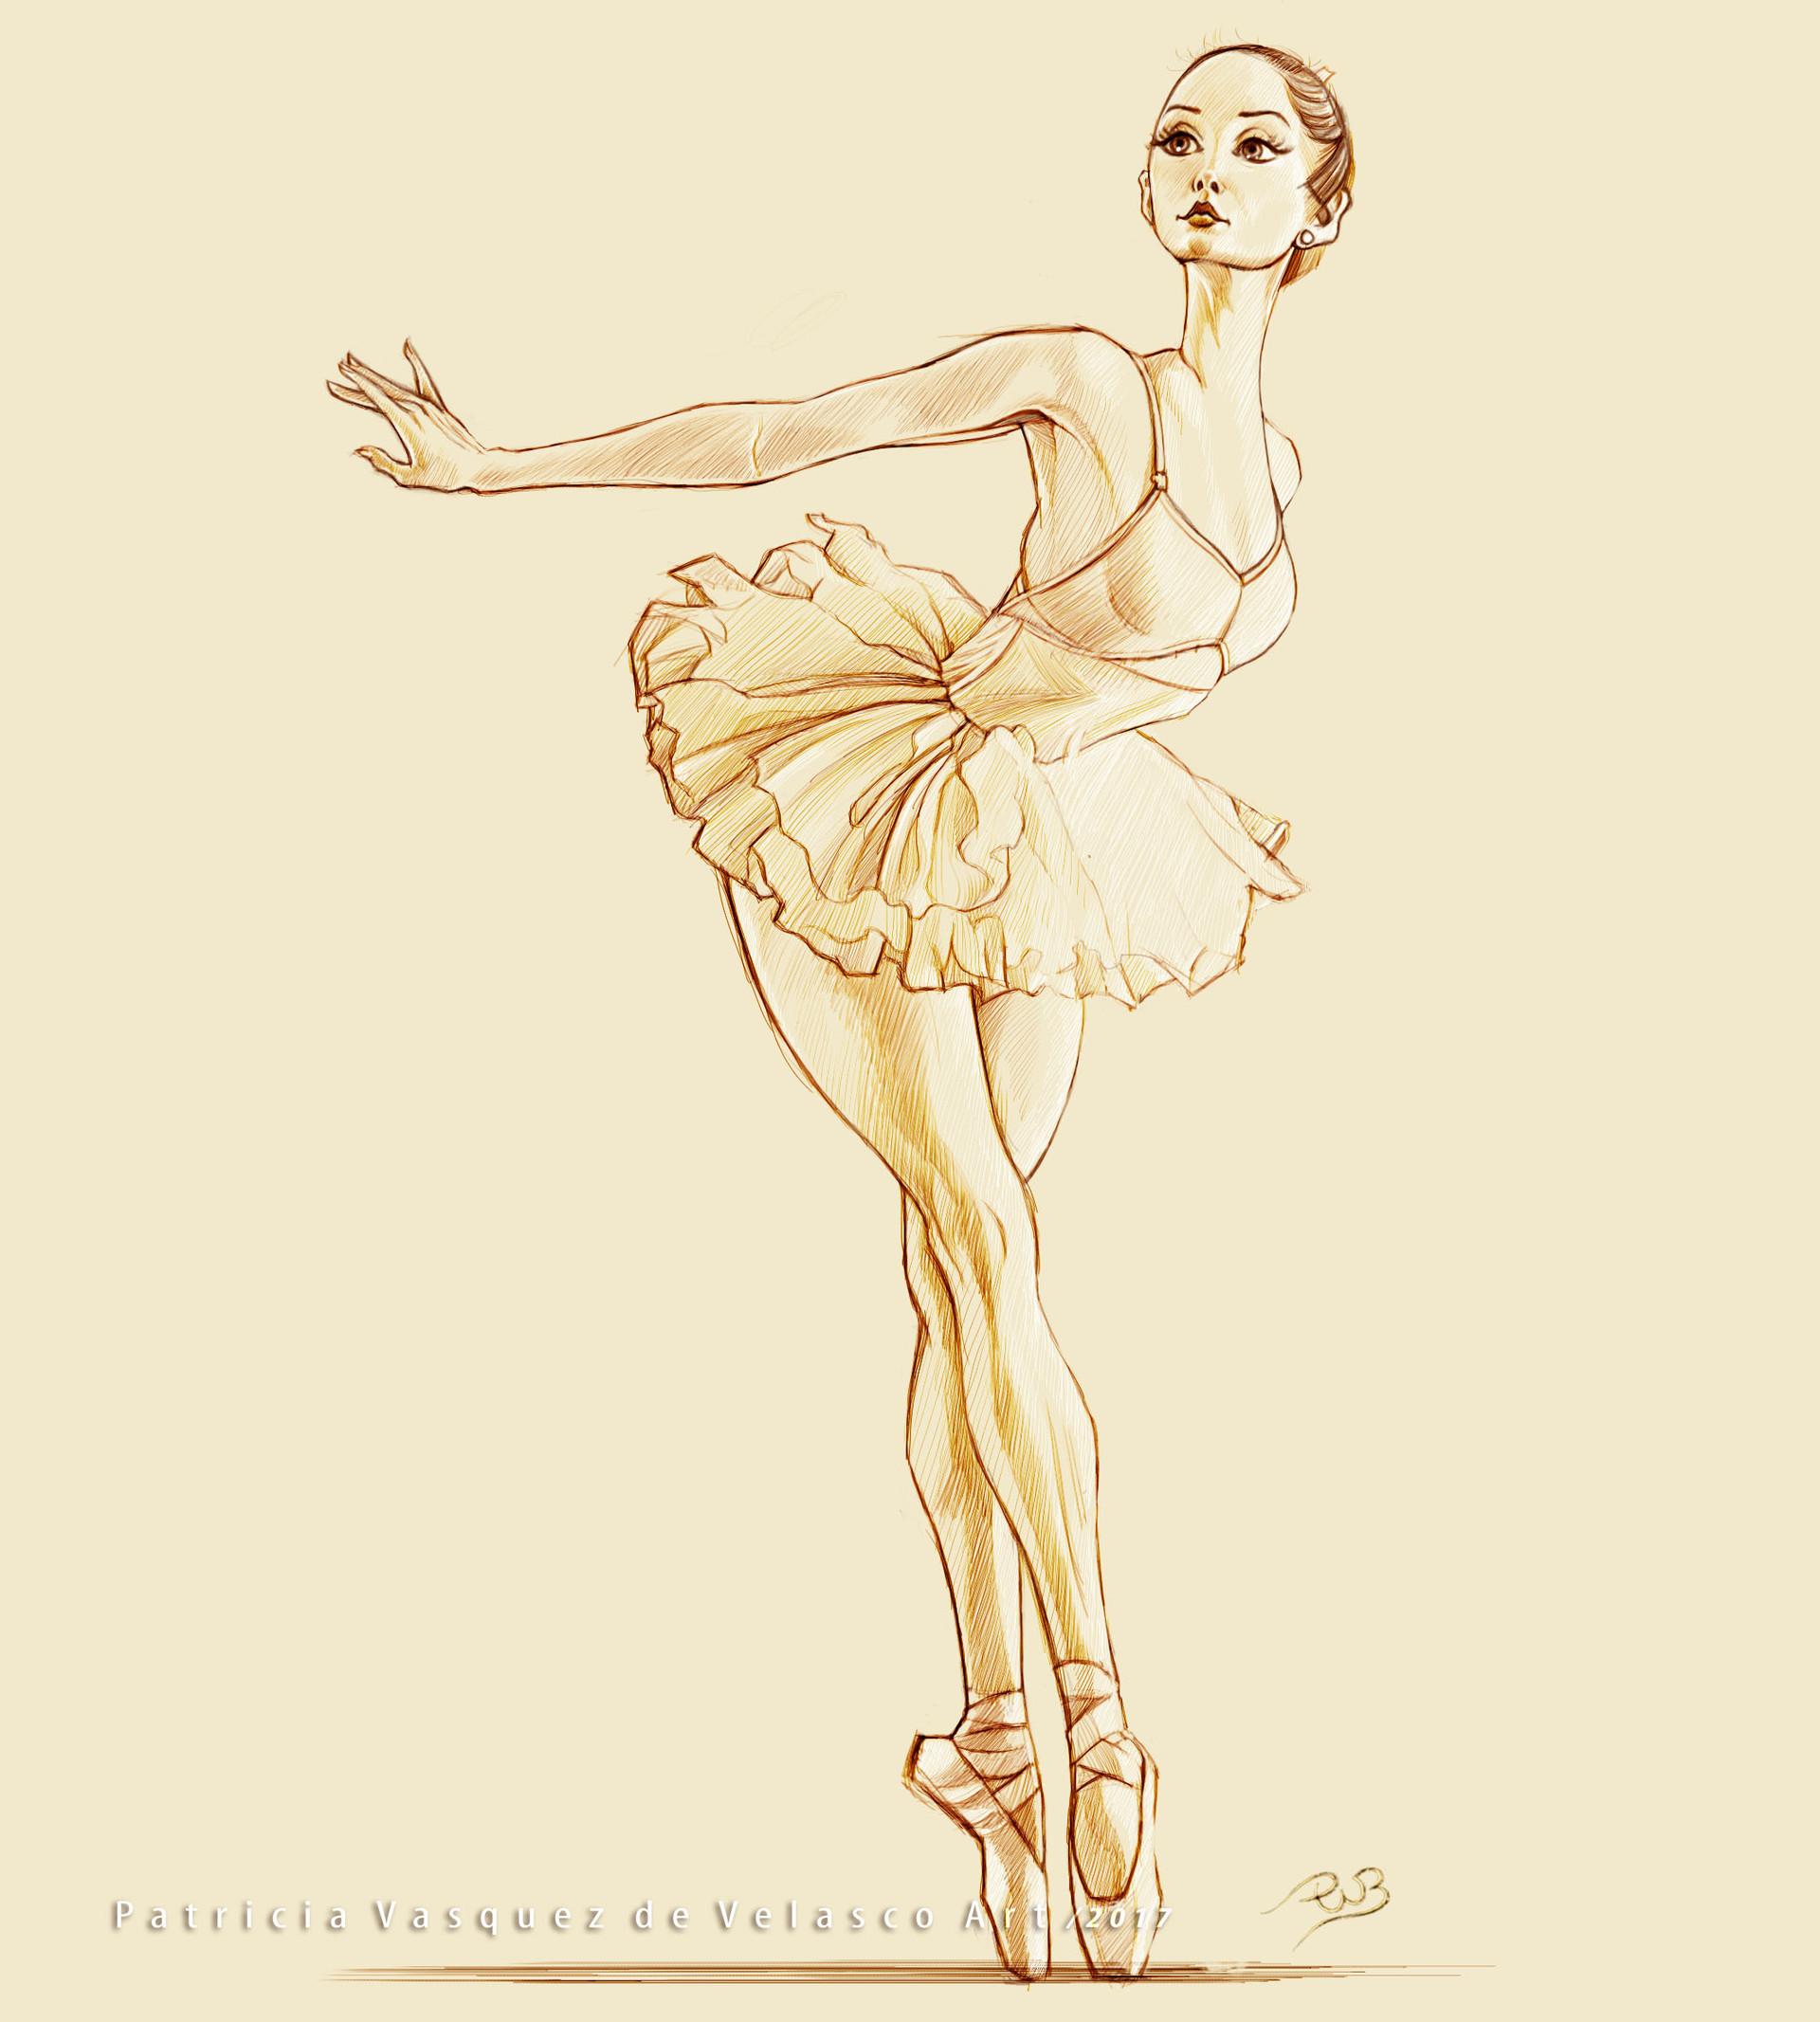 Patricia vasquez de velasco bailarina 01 tinta